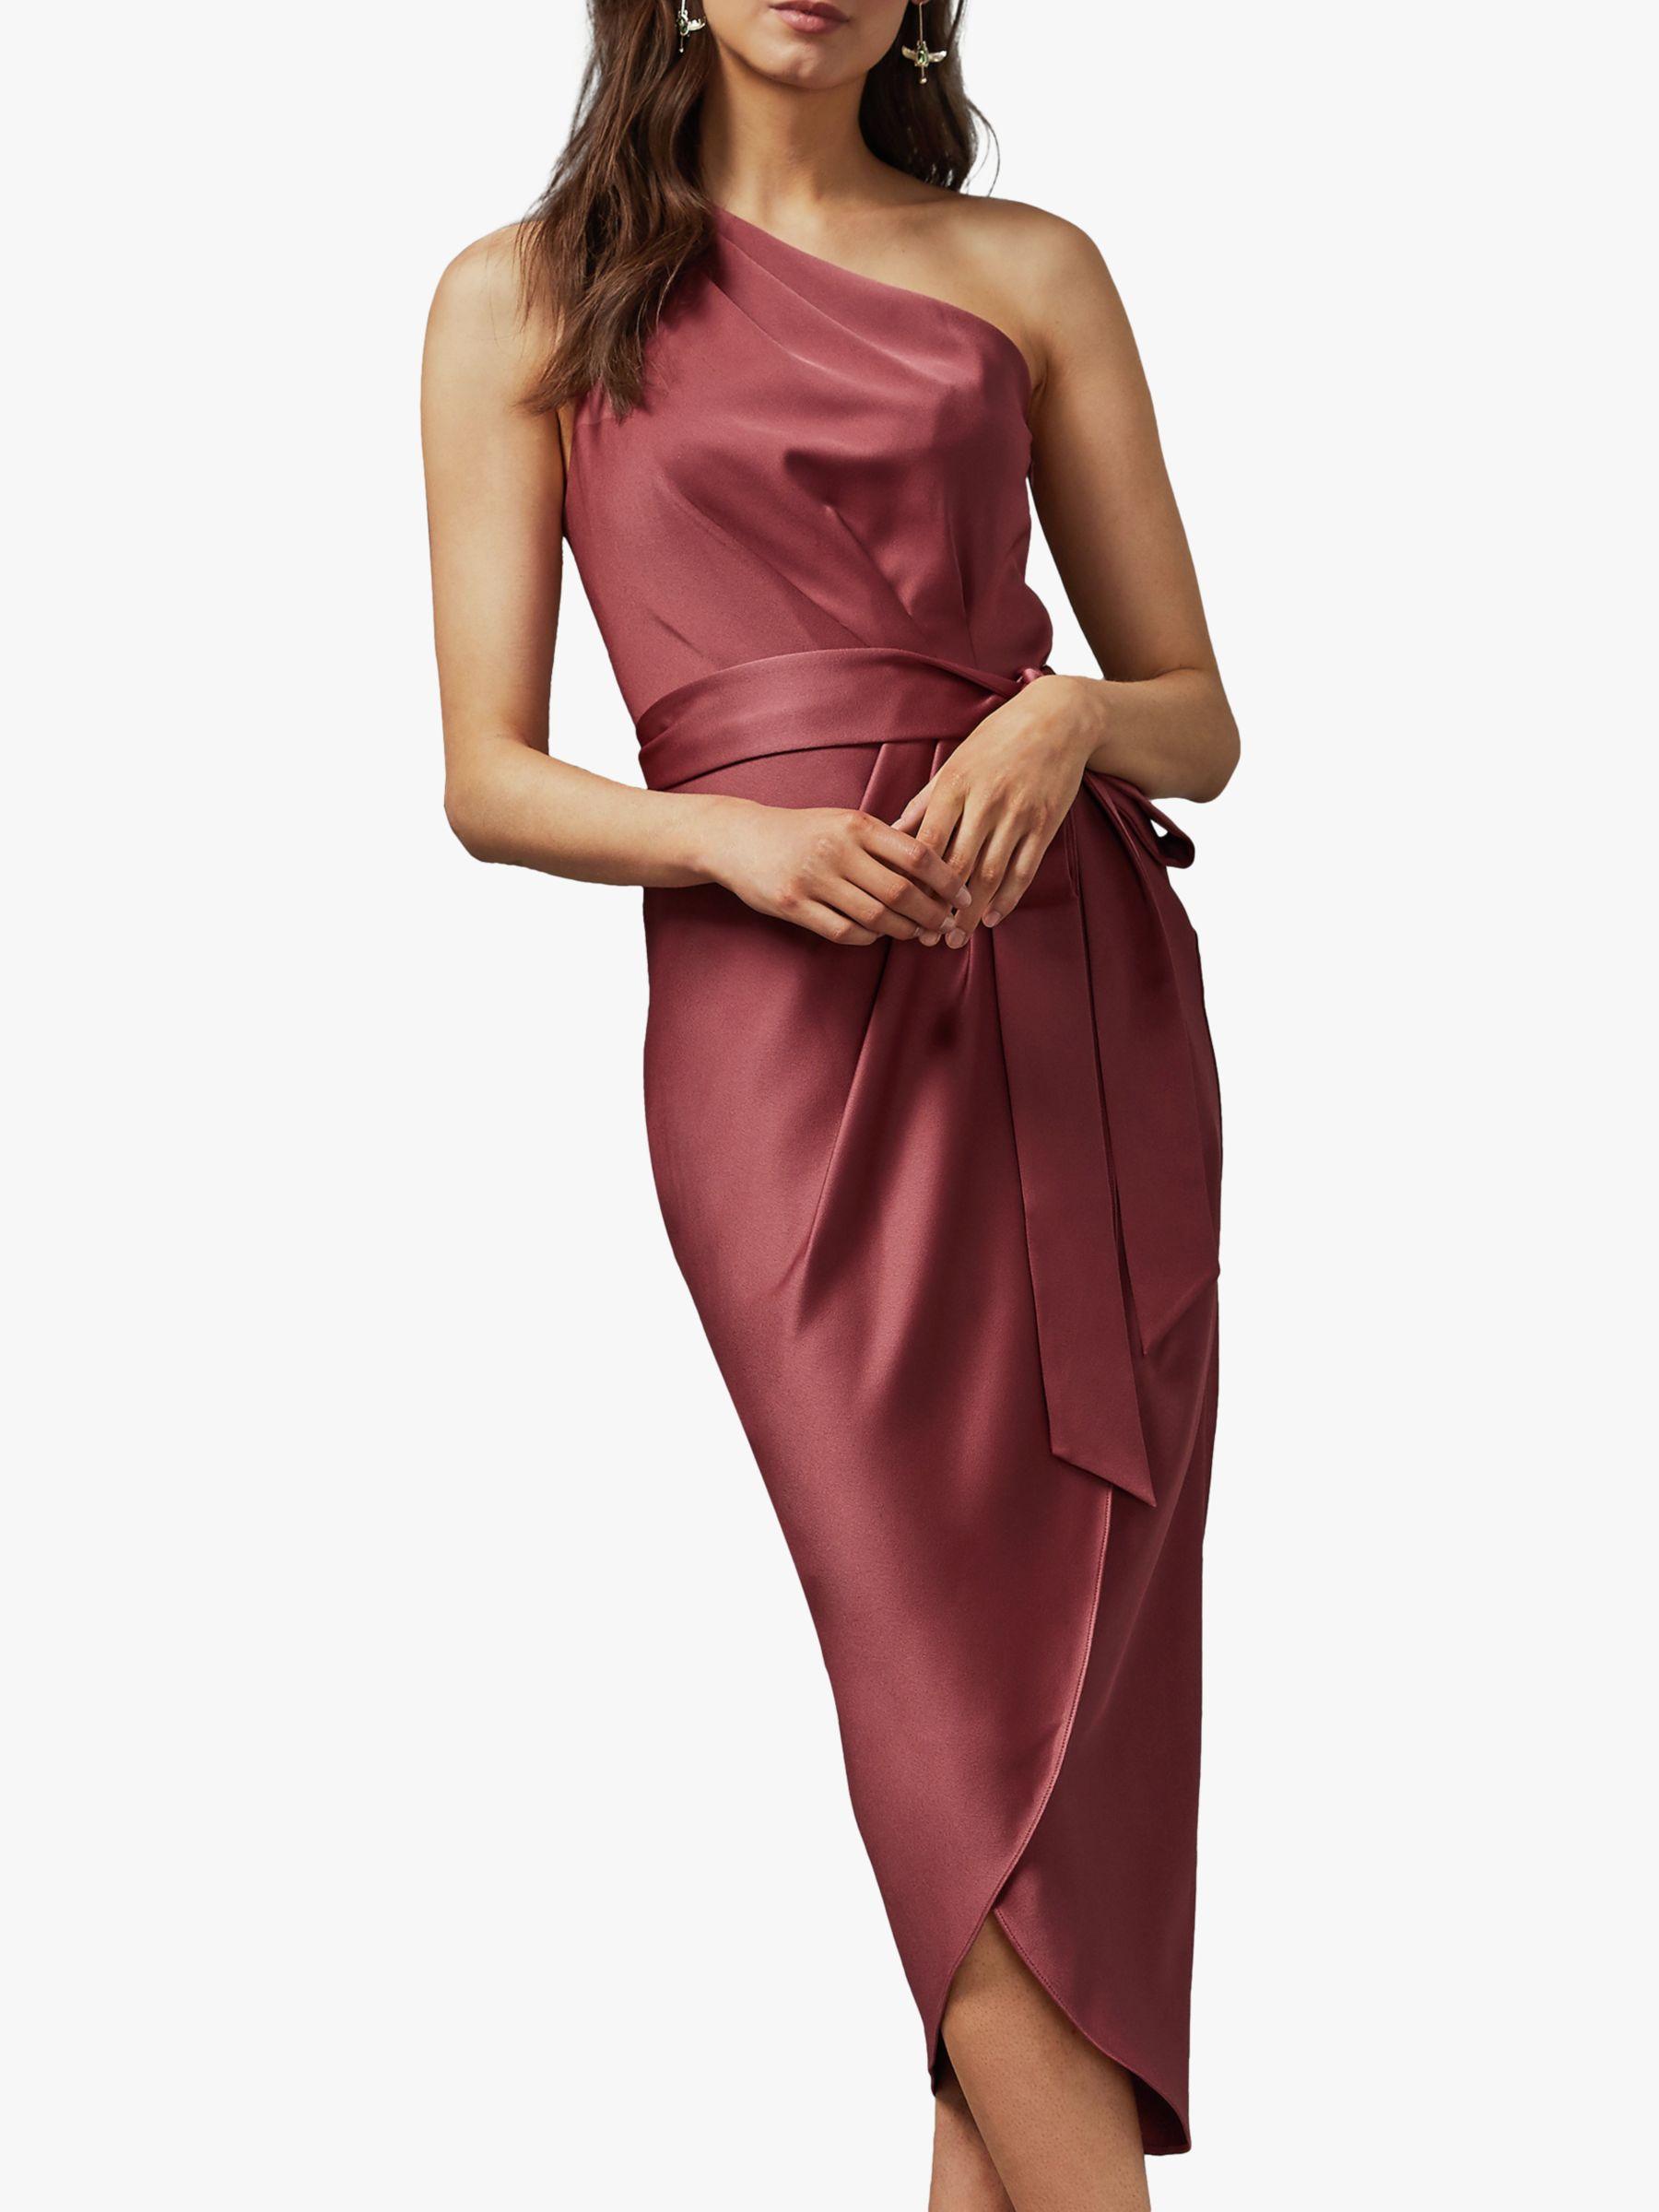 Ted Baker Gabie One Shoulder Drape Midi Dress Pink At John Lewis Partners